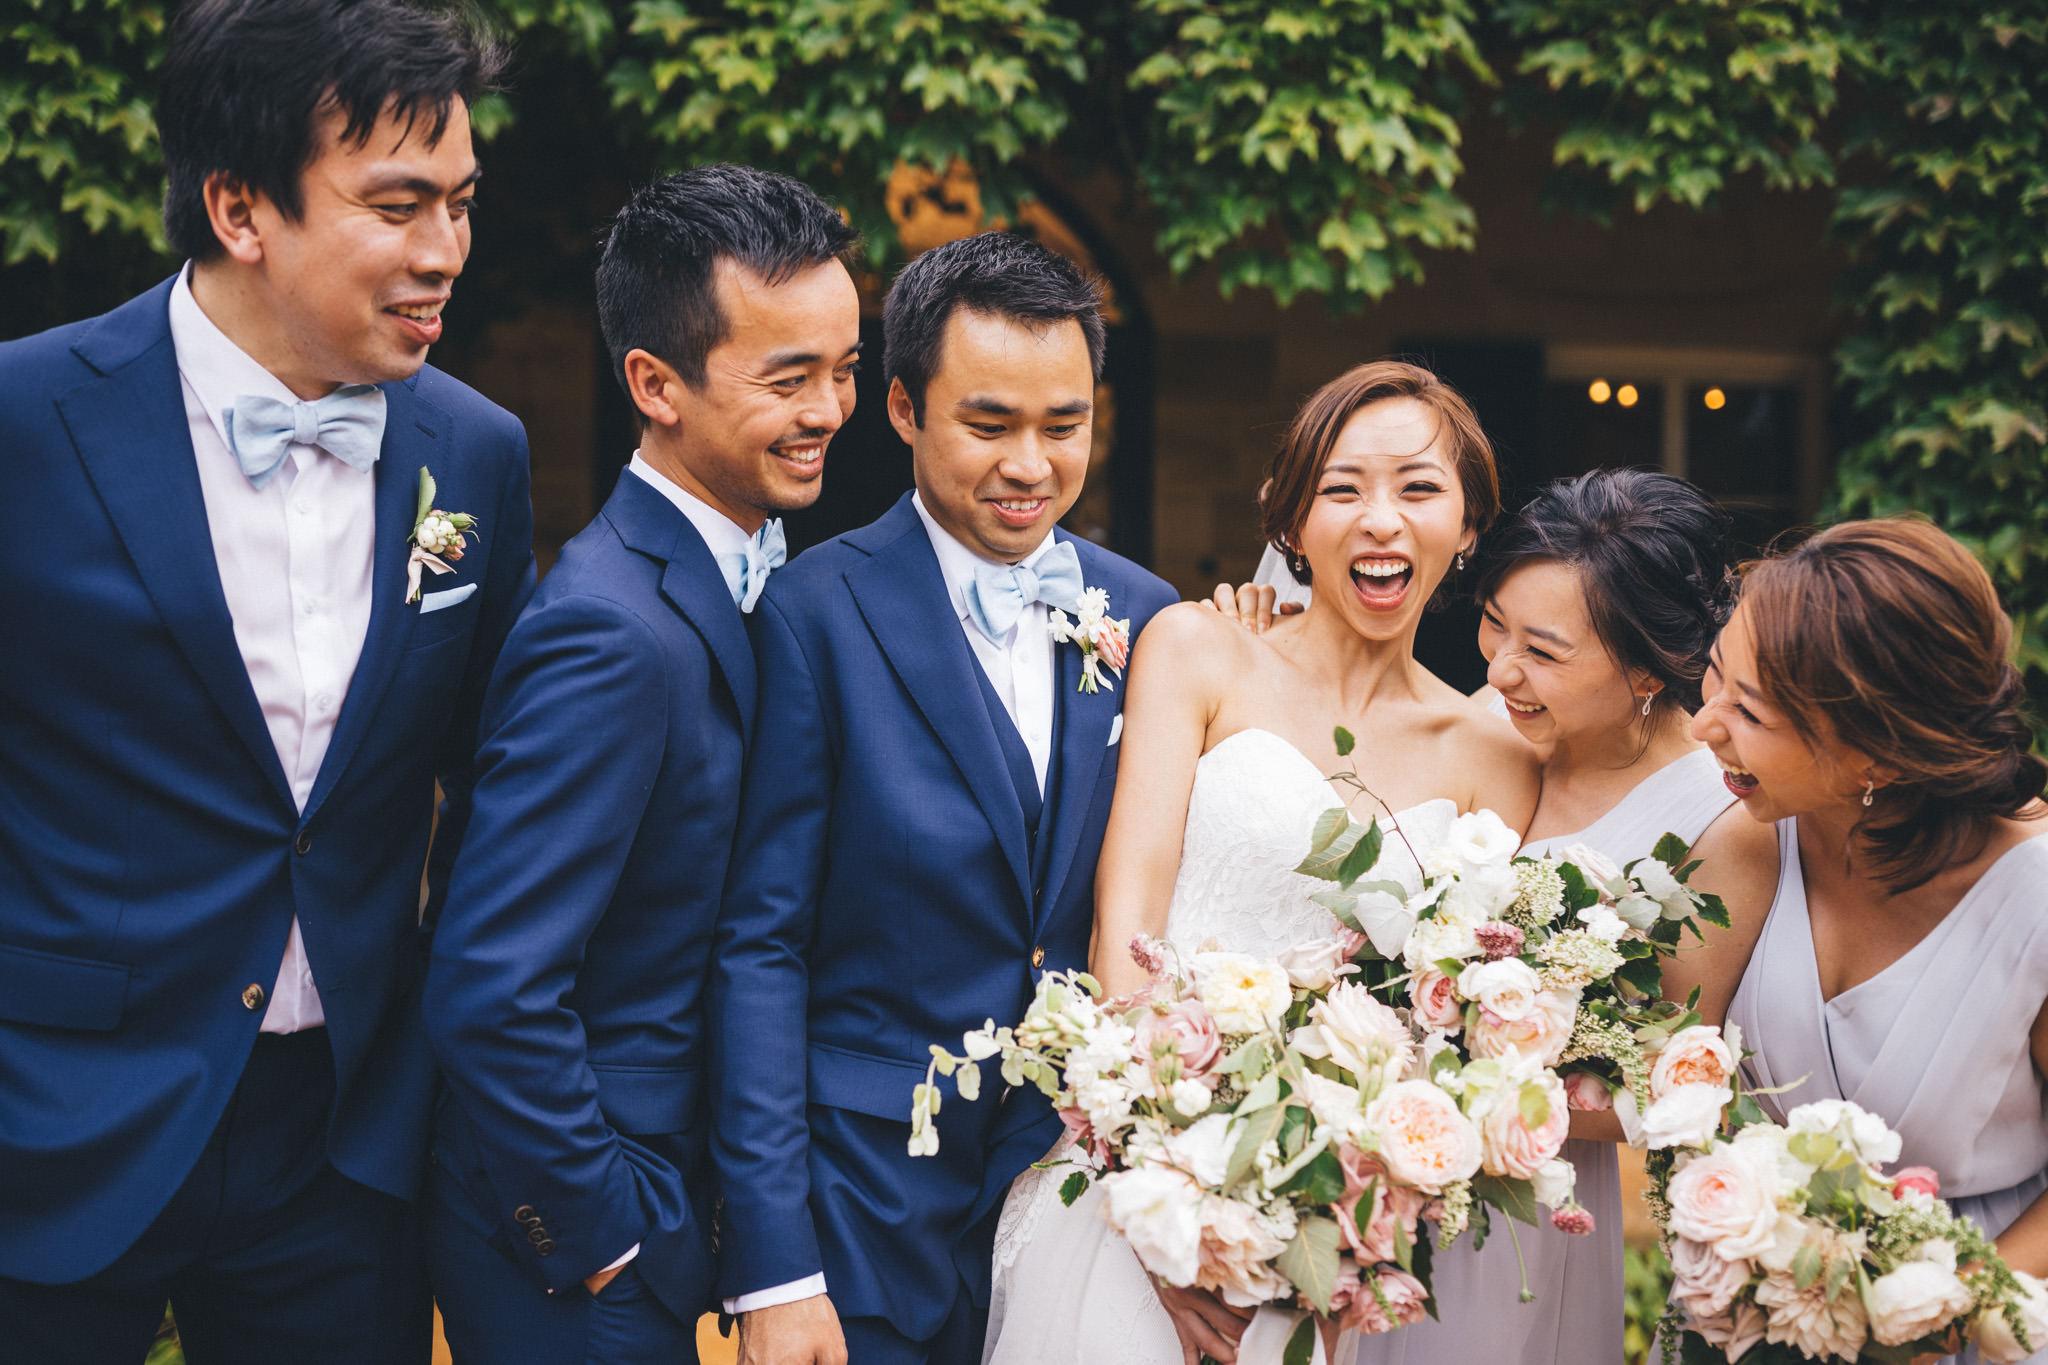 Ann-Marie-Yuen-Photography-0121.jpg